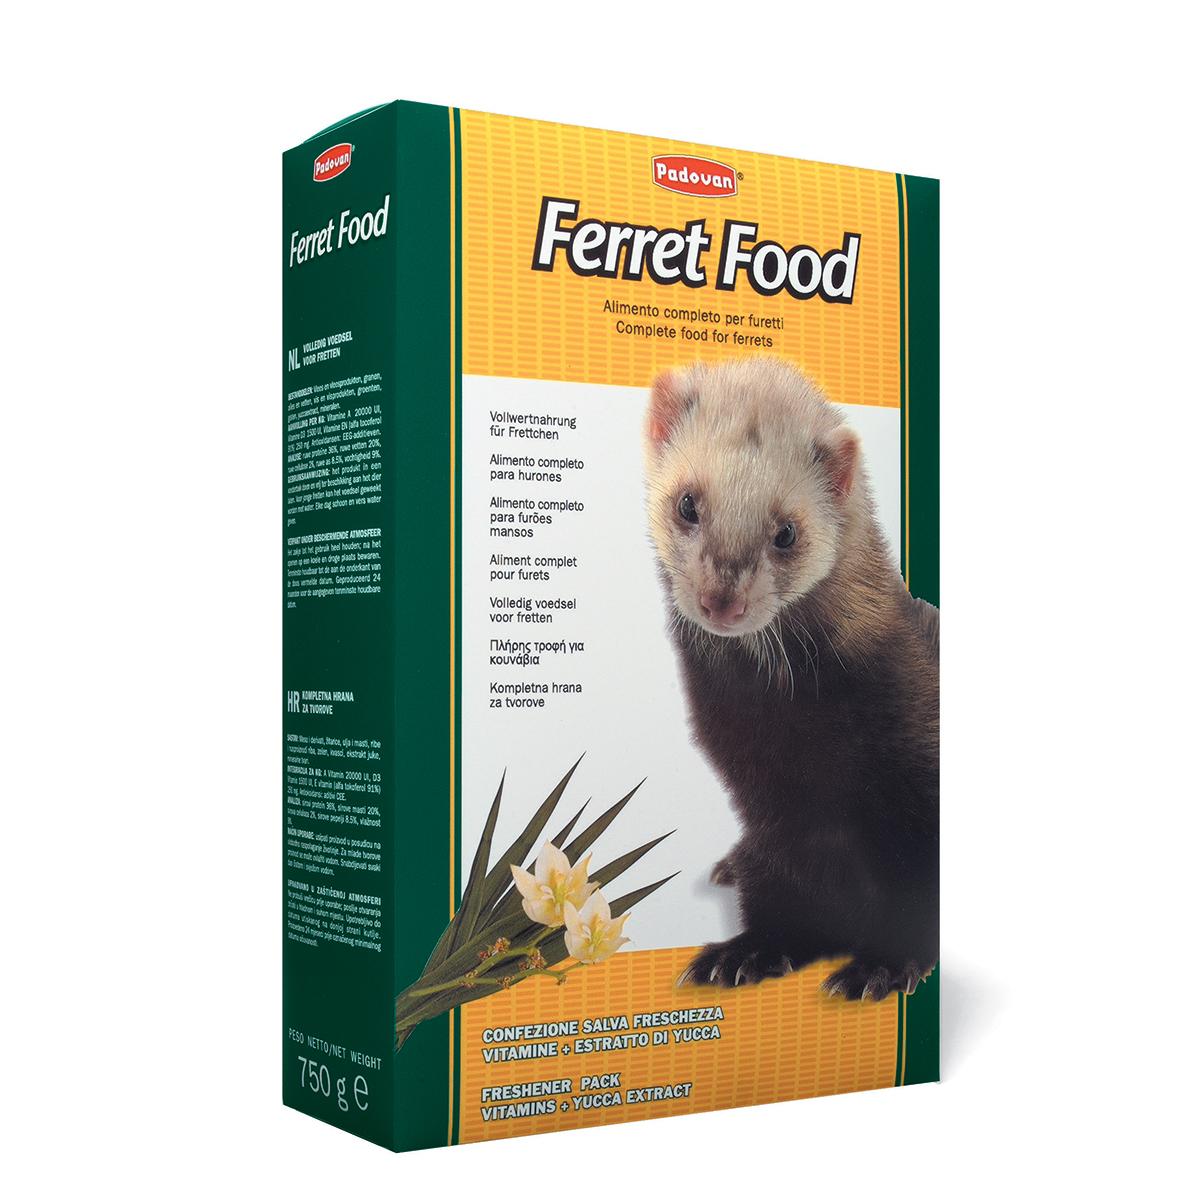 Ferret Food Hrana Pentru Dihori 750g